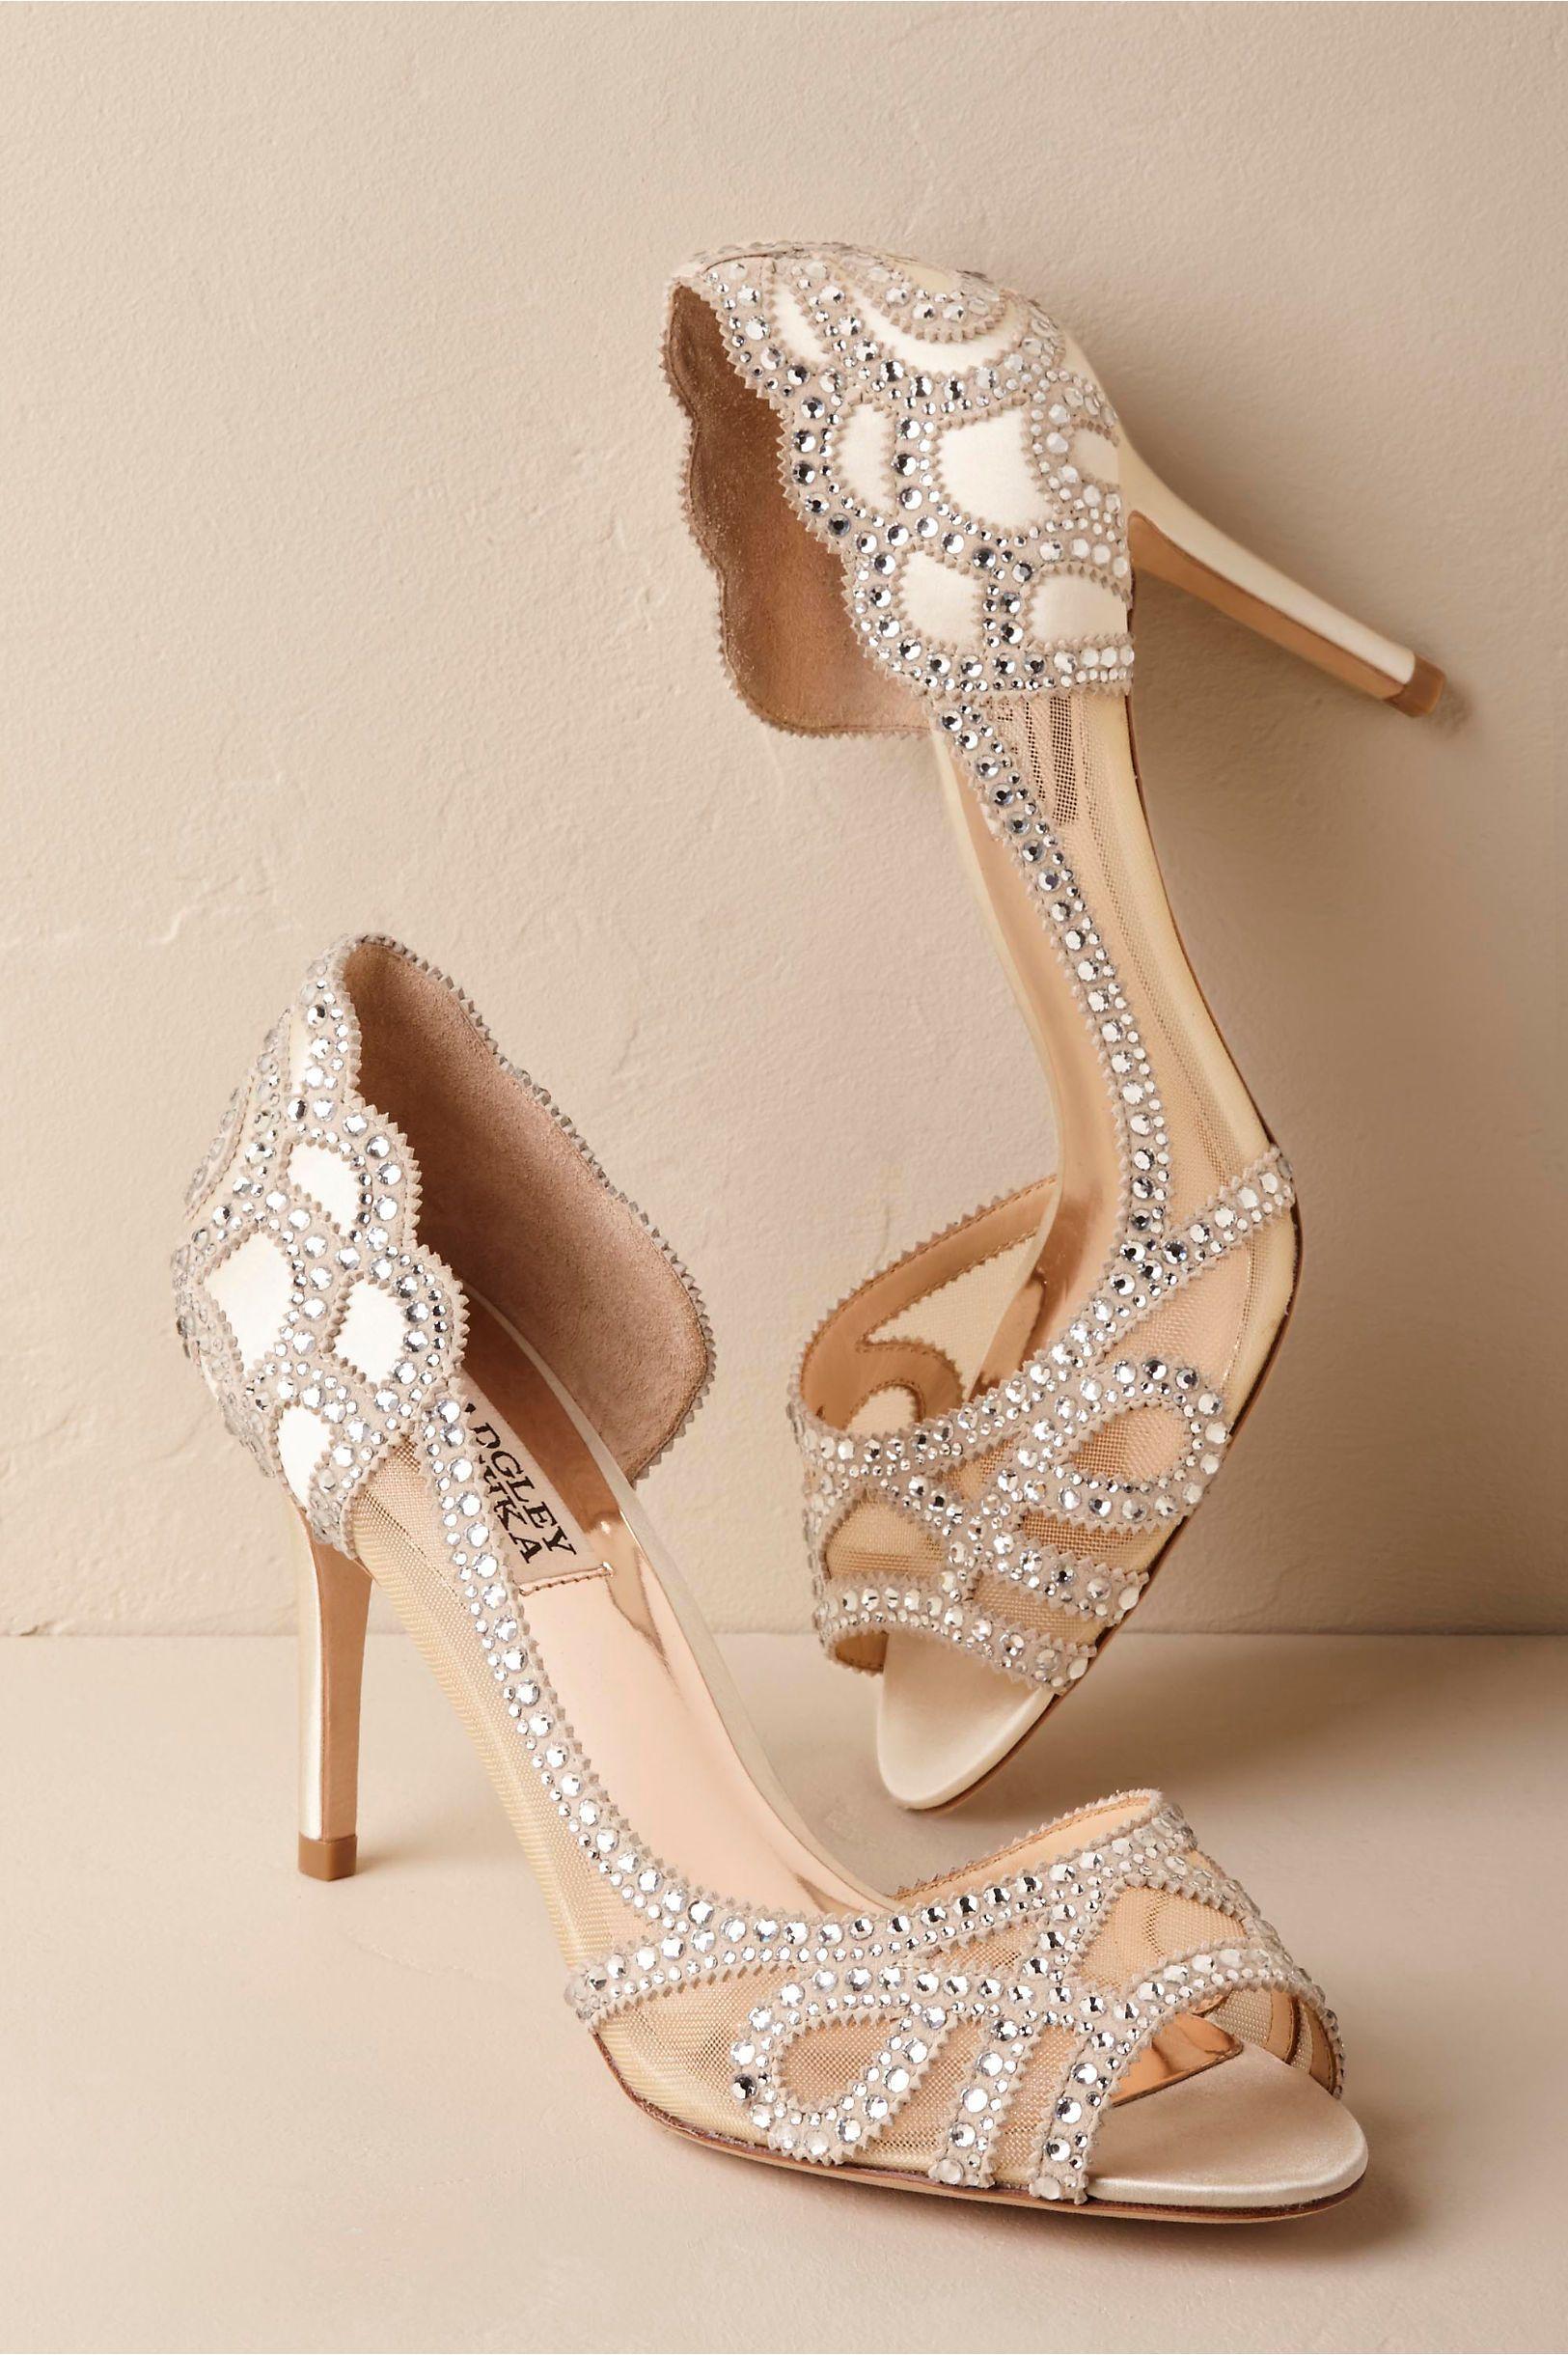 BHLDN's Badgley Mischka Natoli Heels in Ivory   Bride shoes